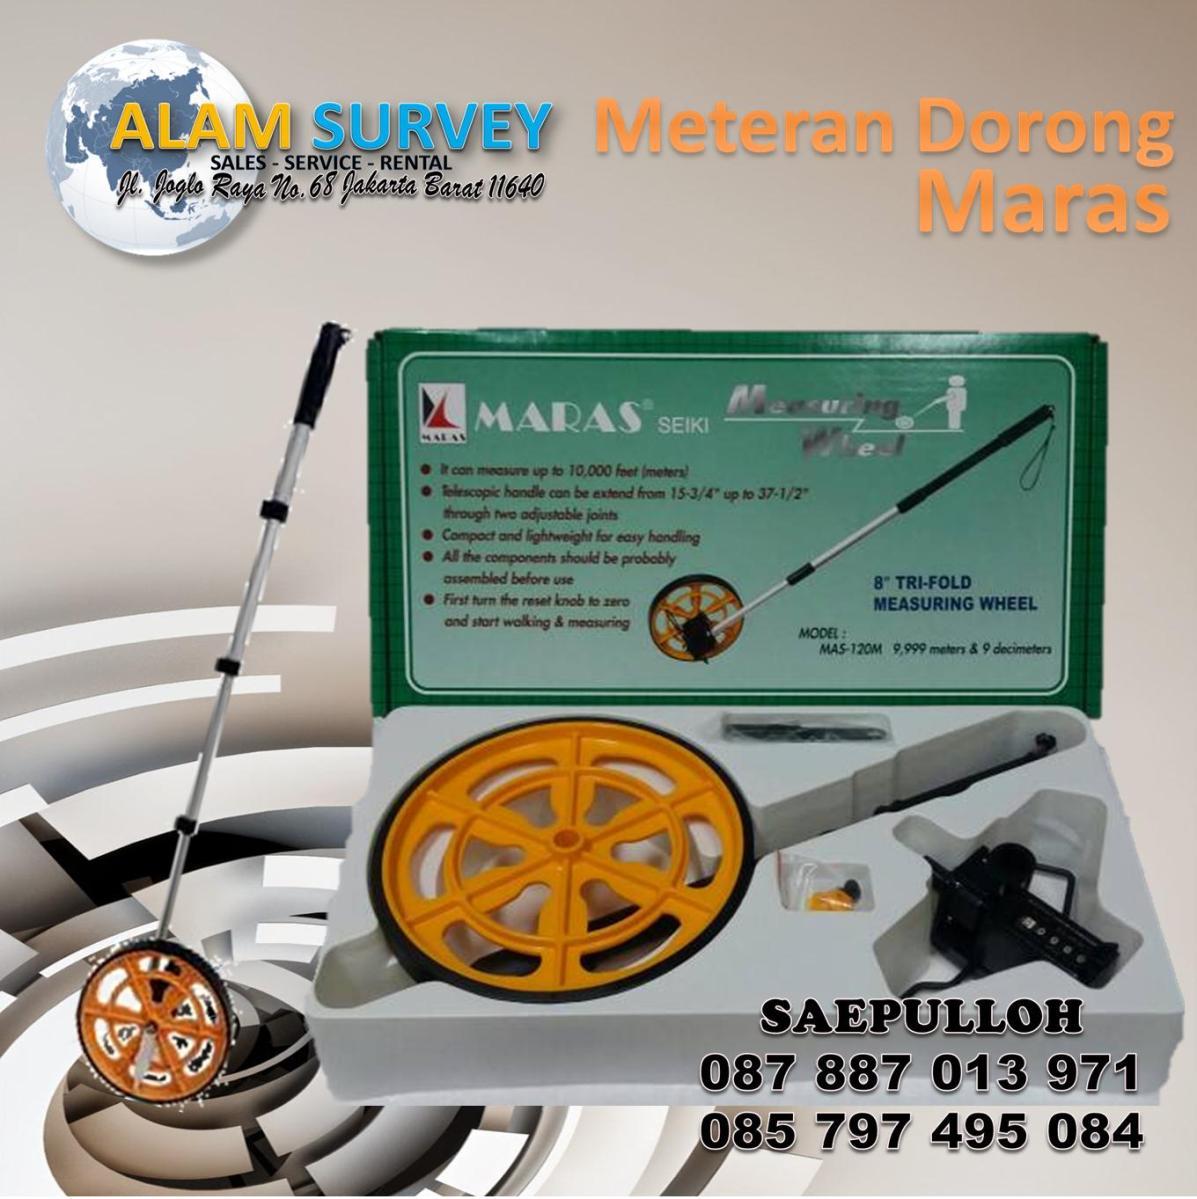 Meteran Dorong Maras Call